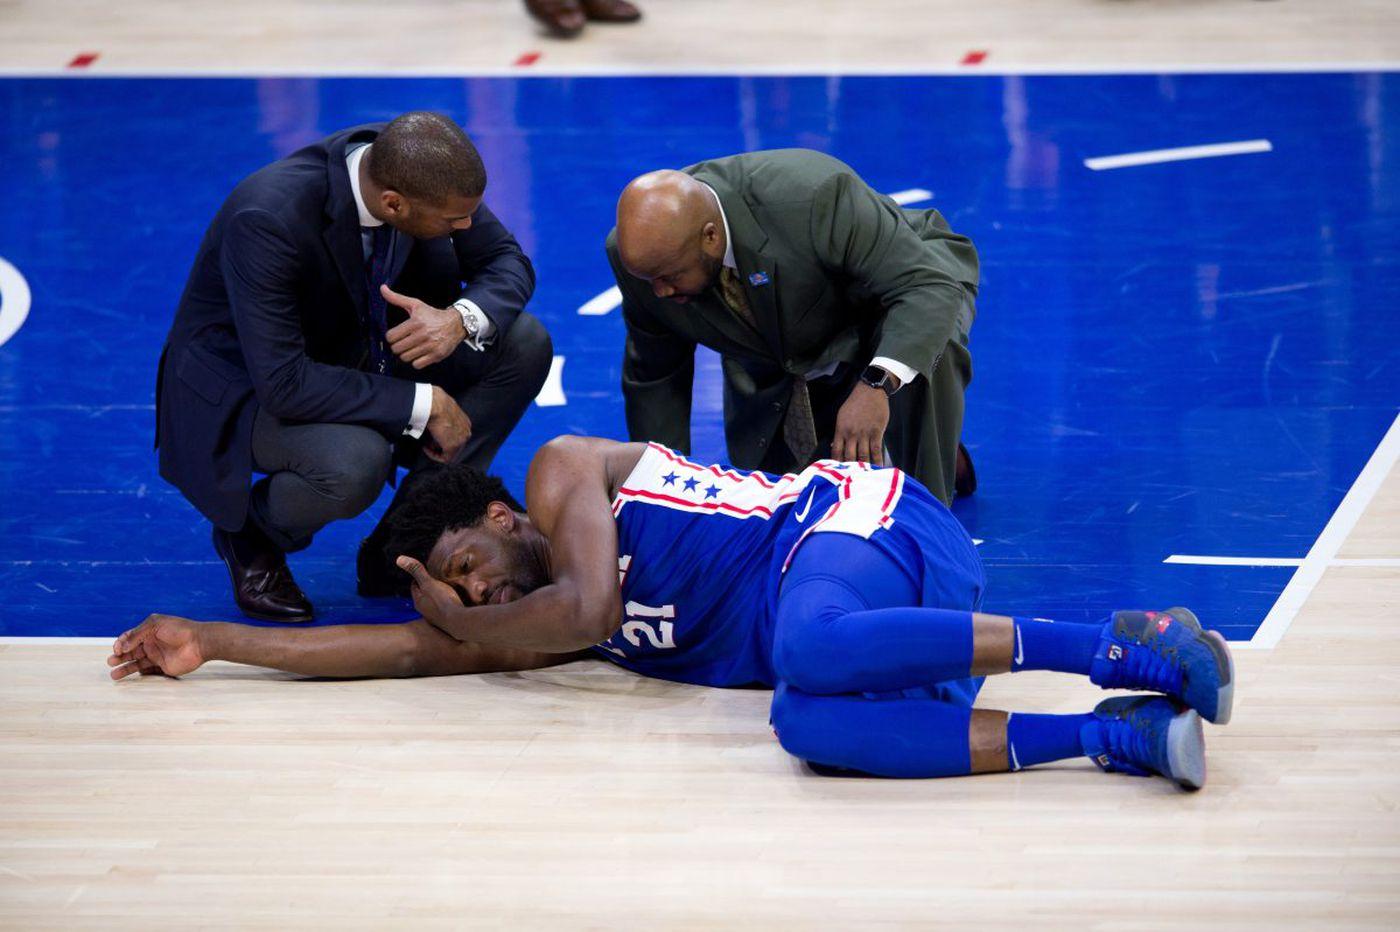 Sixers' Joel Embiid has surgery on orbital bone, could return in two weeks depending on pain